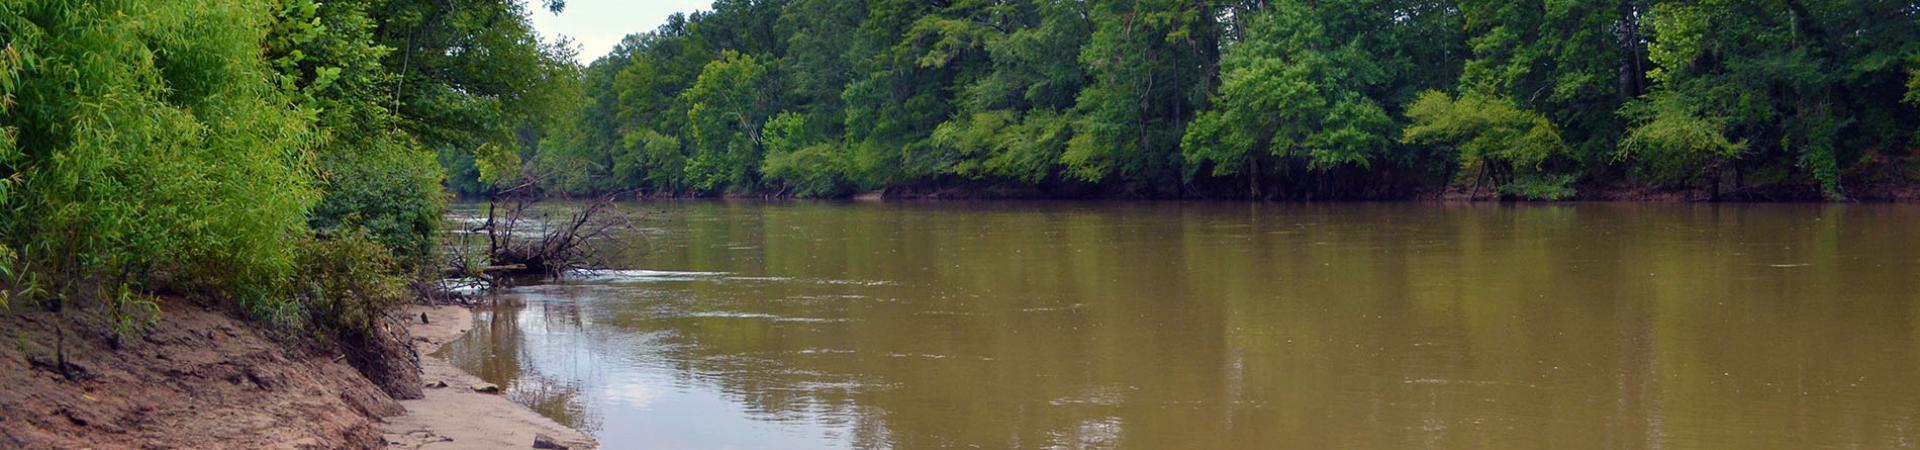 Ball's Ferry River